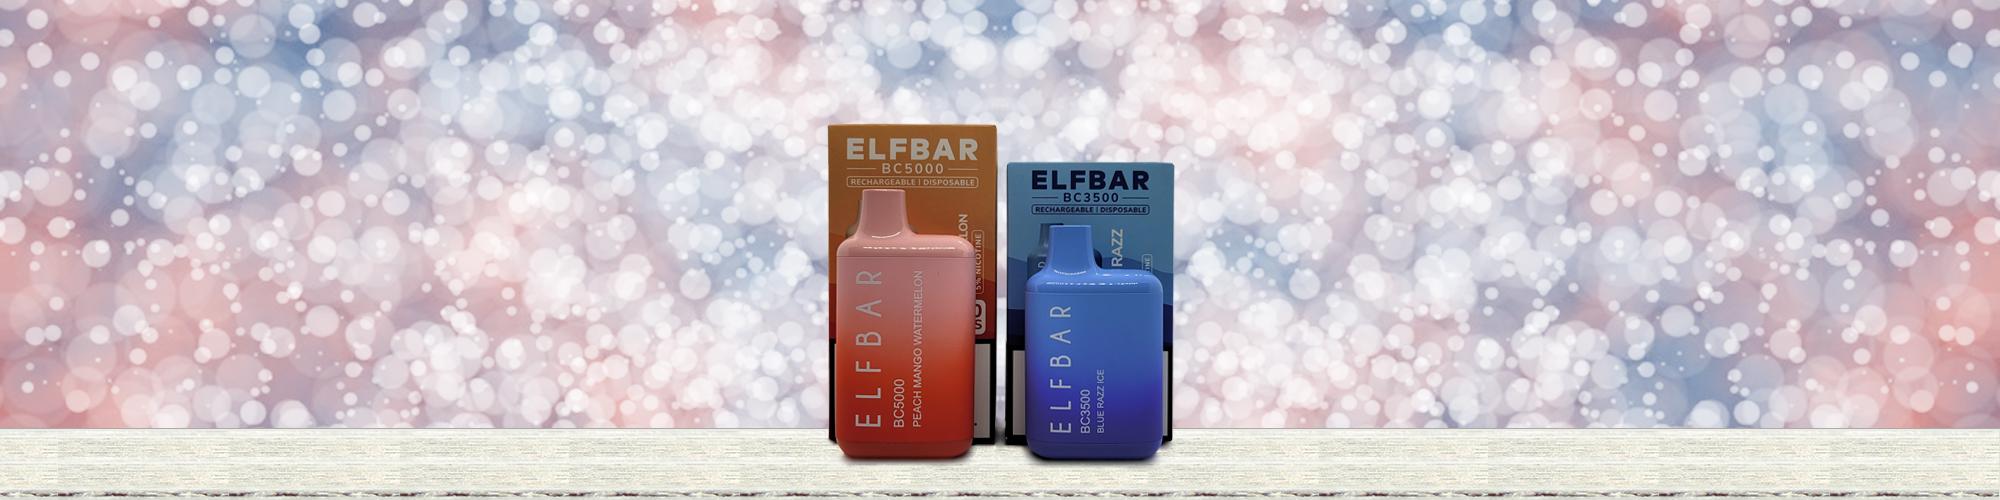 Elfbar BC3500 BC5000 Disposable Review Main Banner